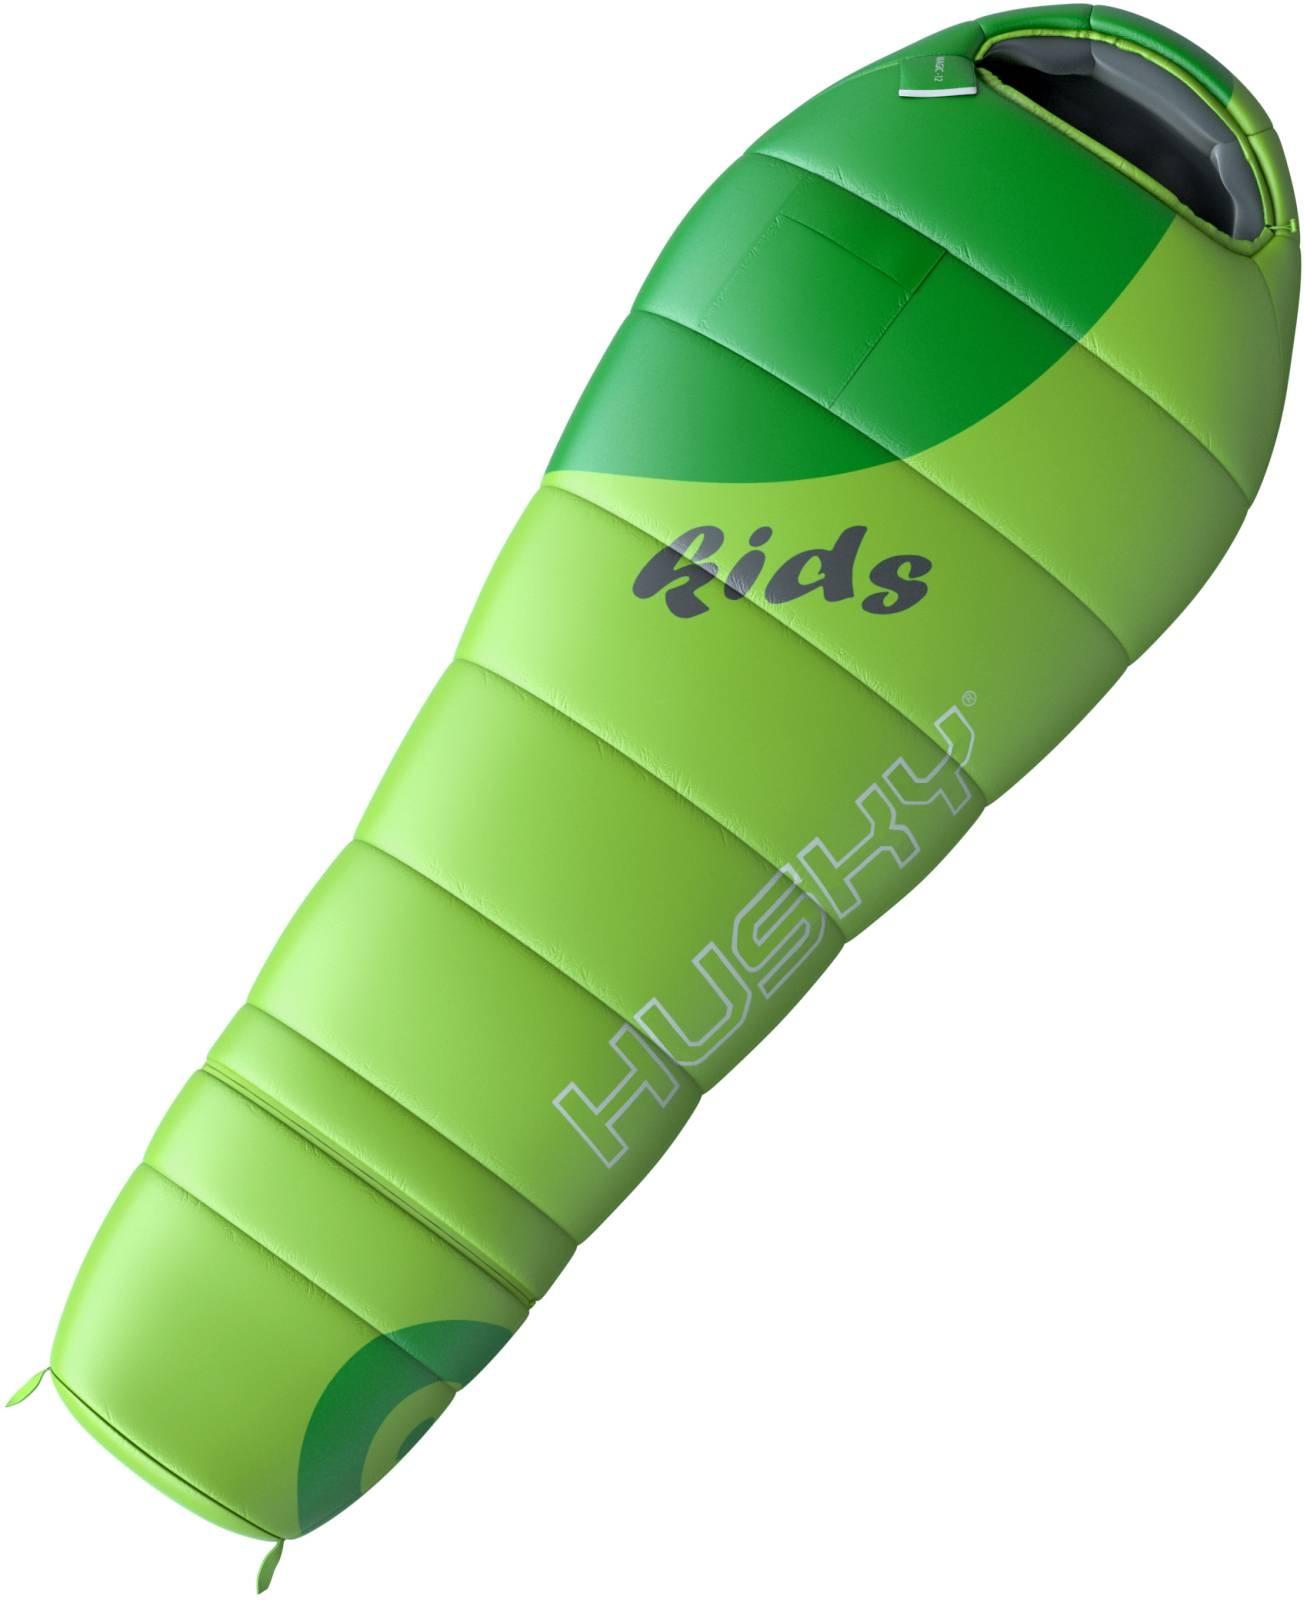 Spacák Outdoor Kids Magic-12°C zelená